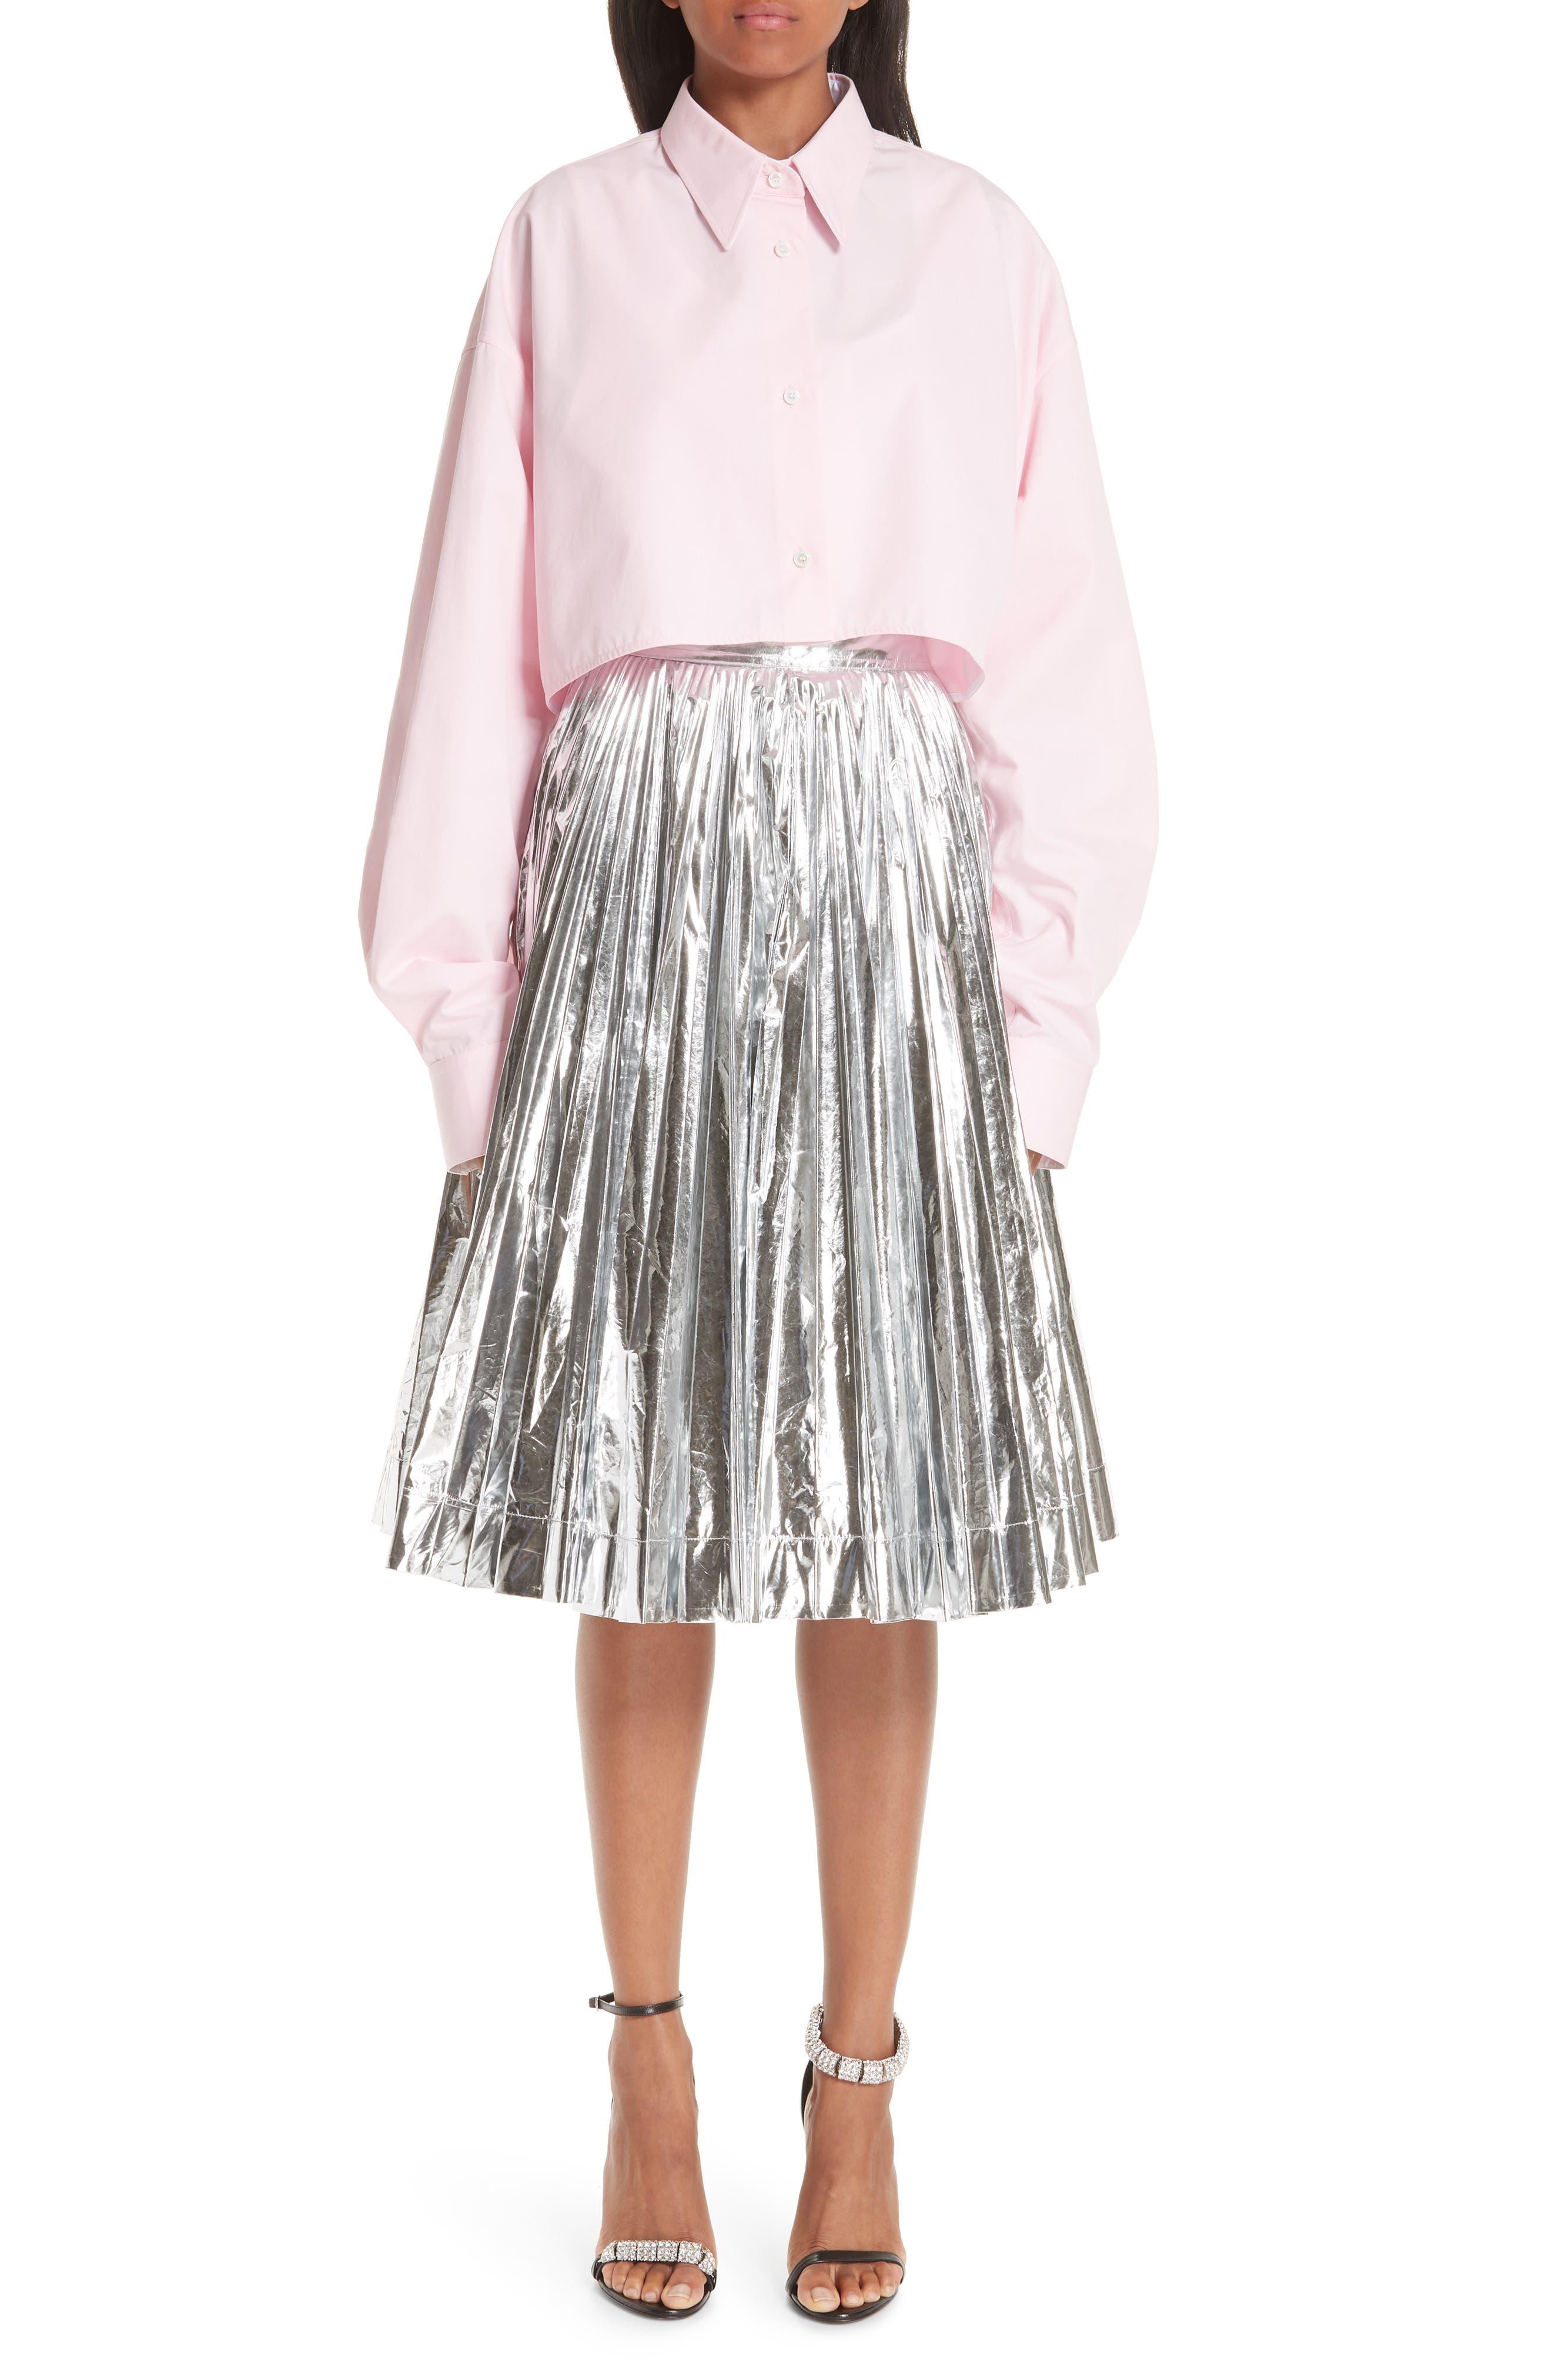 Layered Cotton Poplin Shirt,                             Alternate thumbnail 9, color,                             ROSE OPTIC WHITE